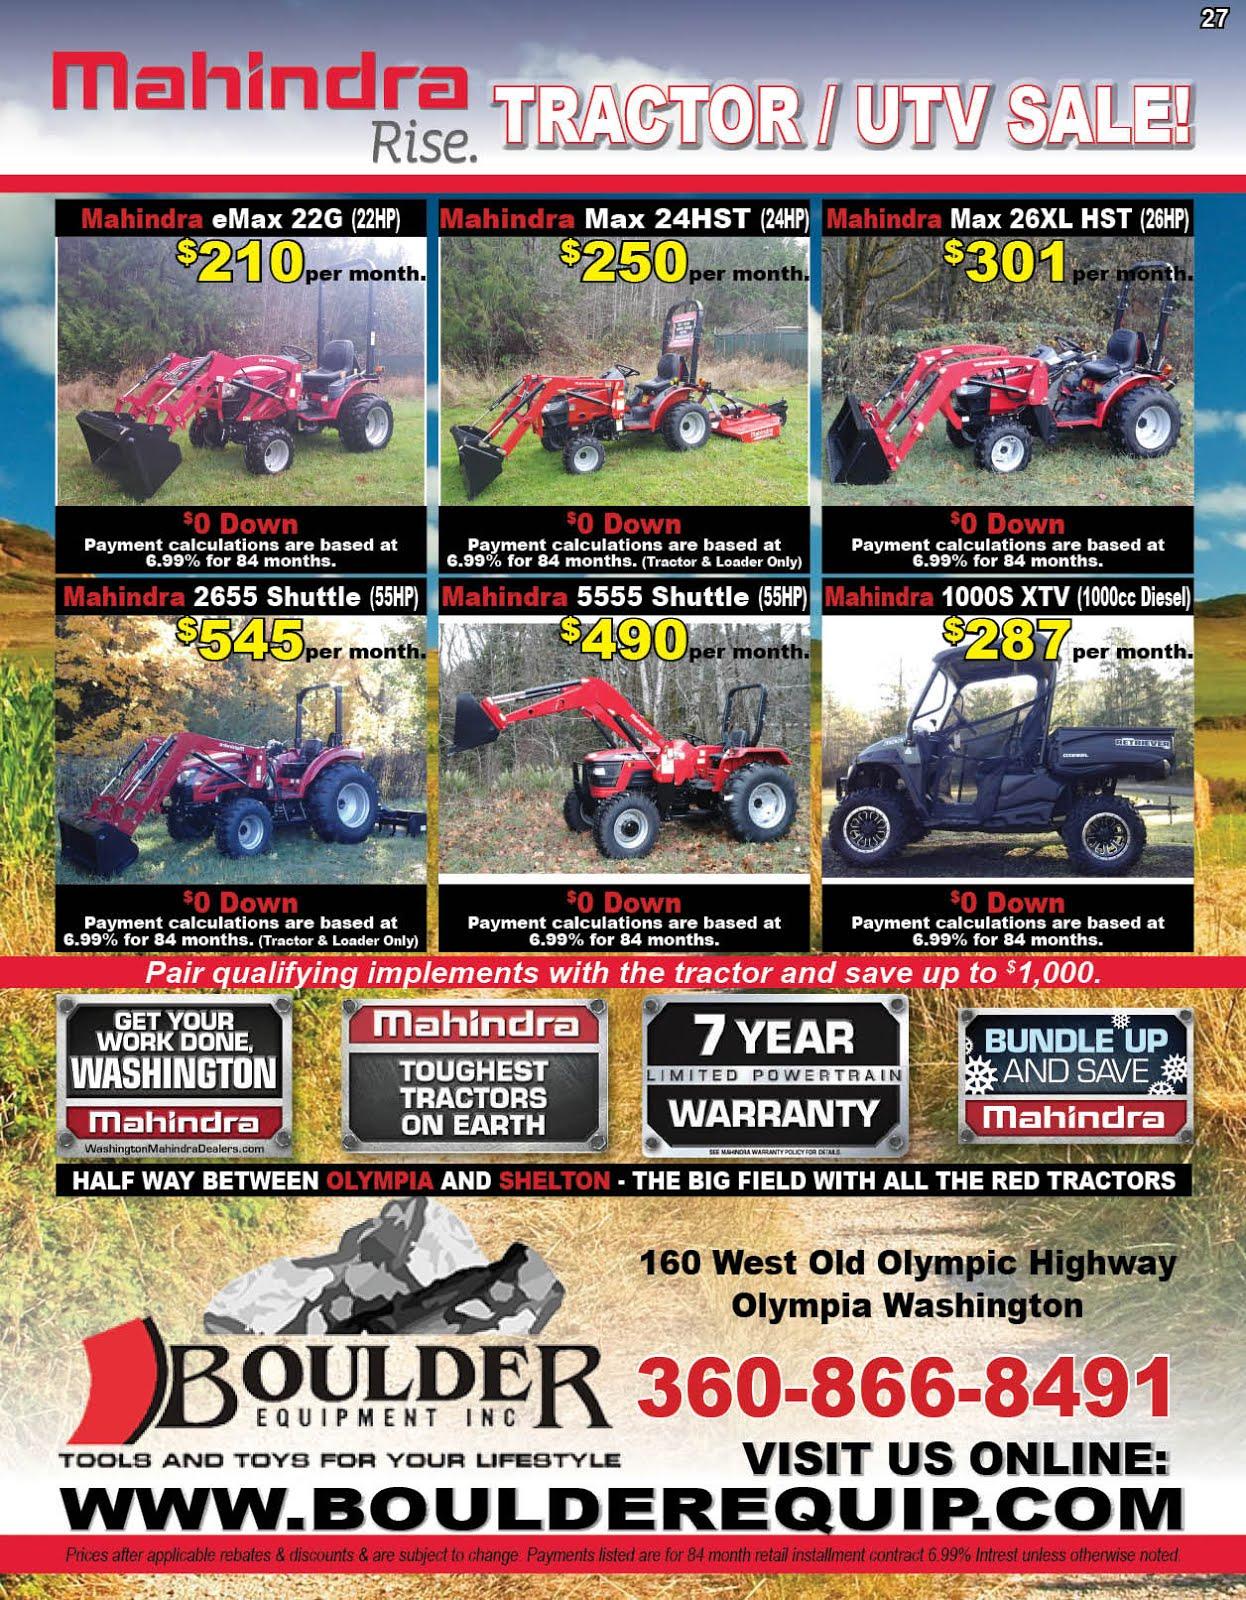 Boulder Equipment New Mahindra Tractor/UTV Sale!!